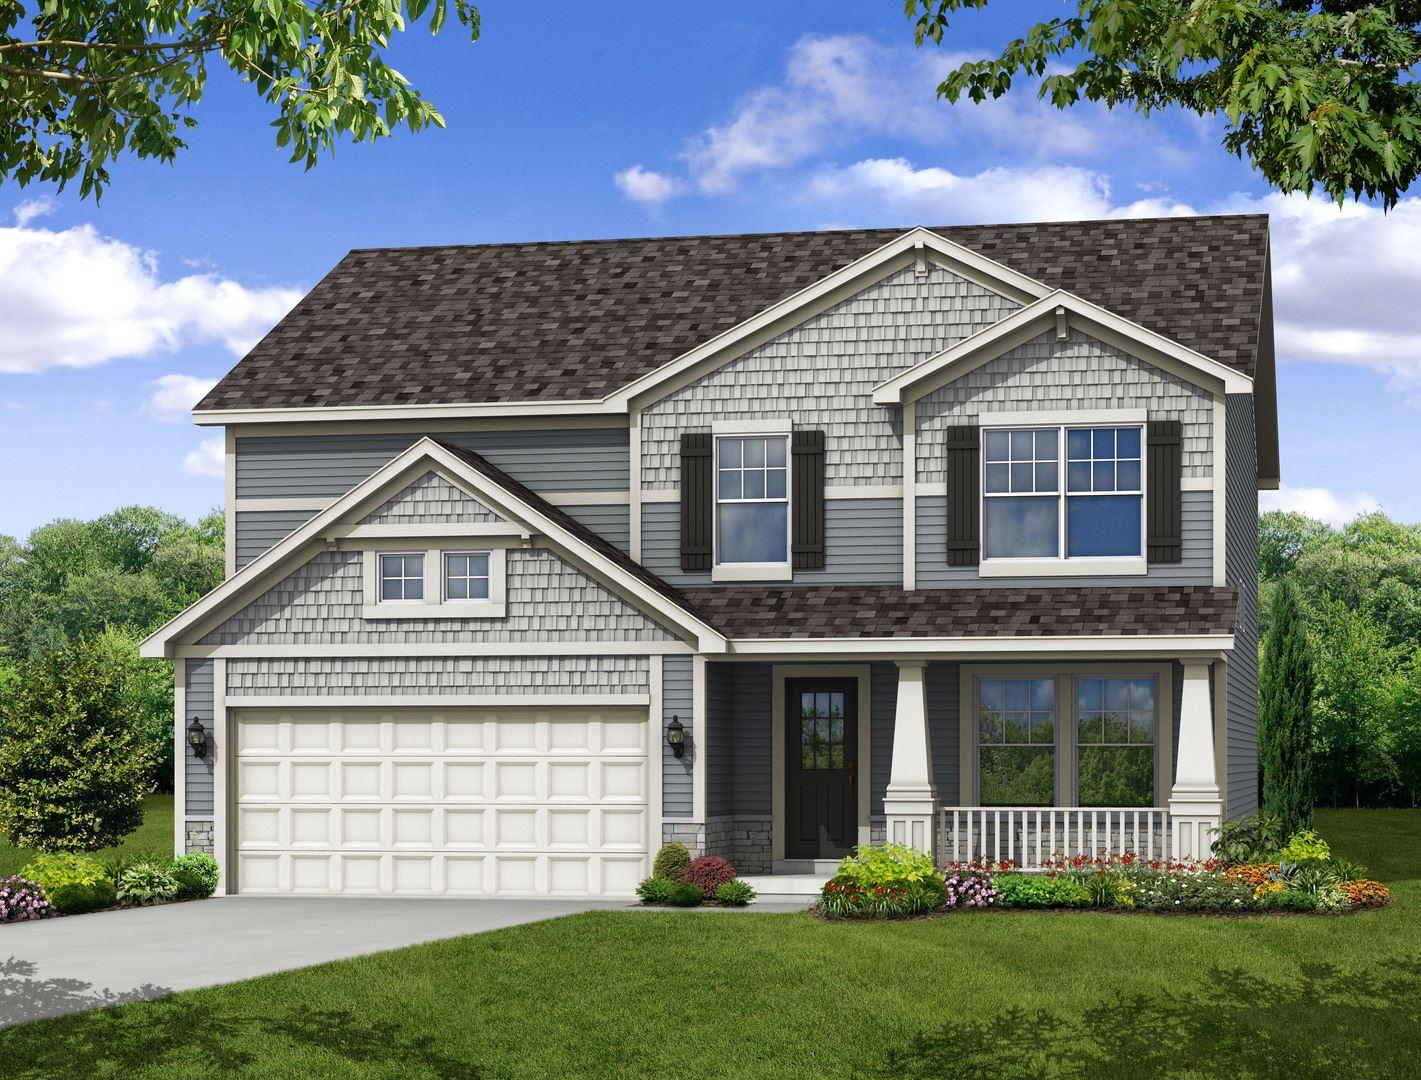 Photo of 561 S Stone Brook Drive S, Romeoville, IL 60446 (MLS # 10880915)